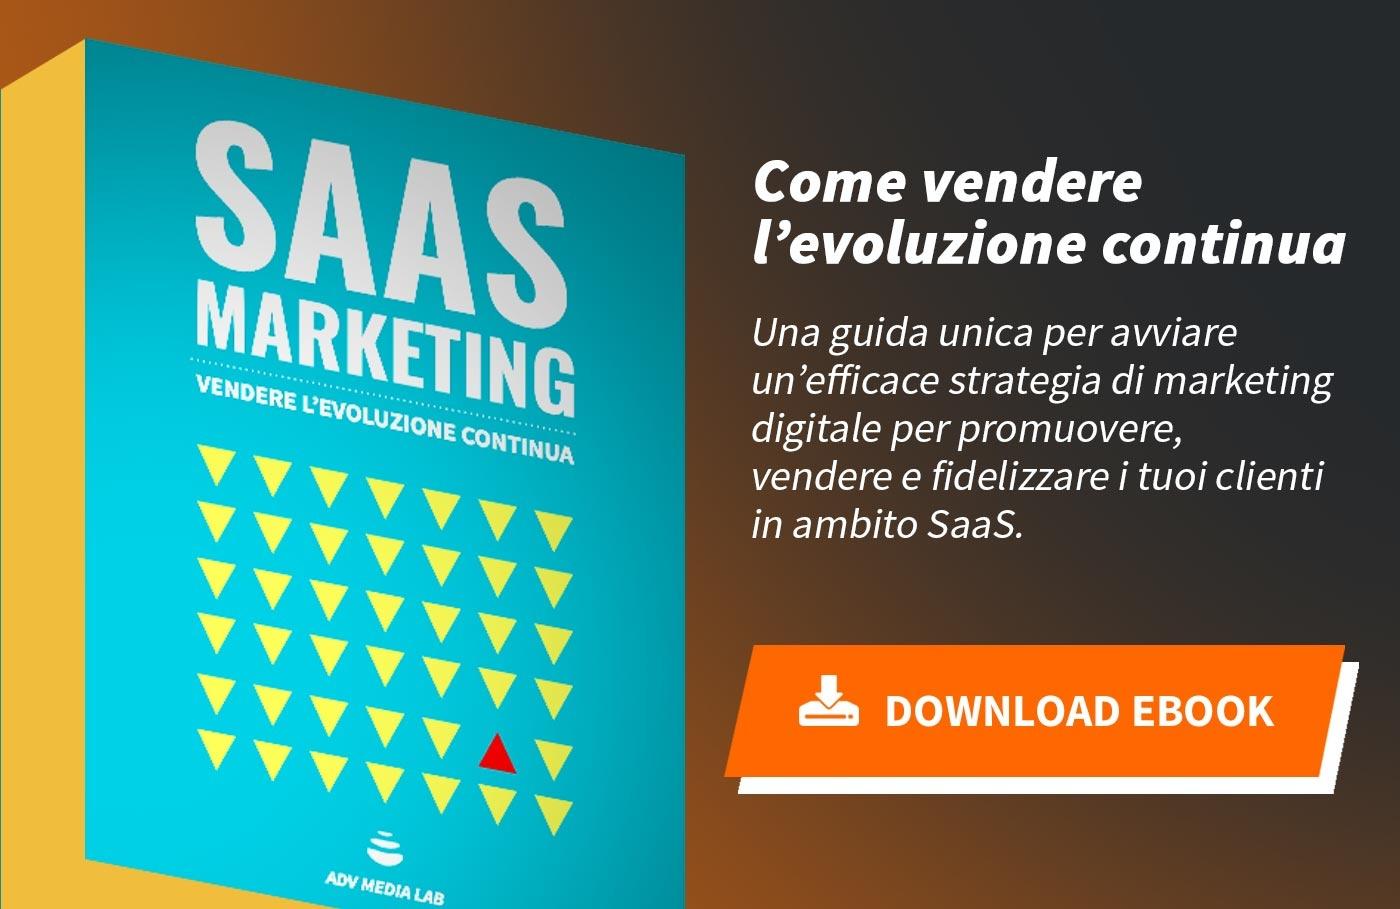 "Scarica l'ebook ""Saas Marketing - Vendere l'evoluzione continua"""